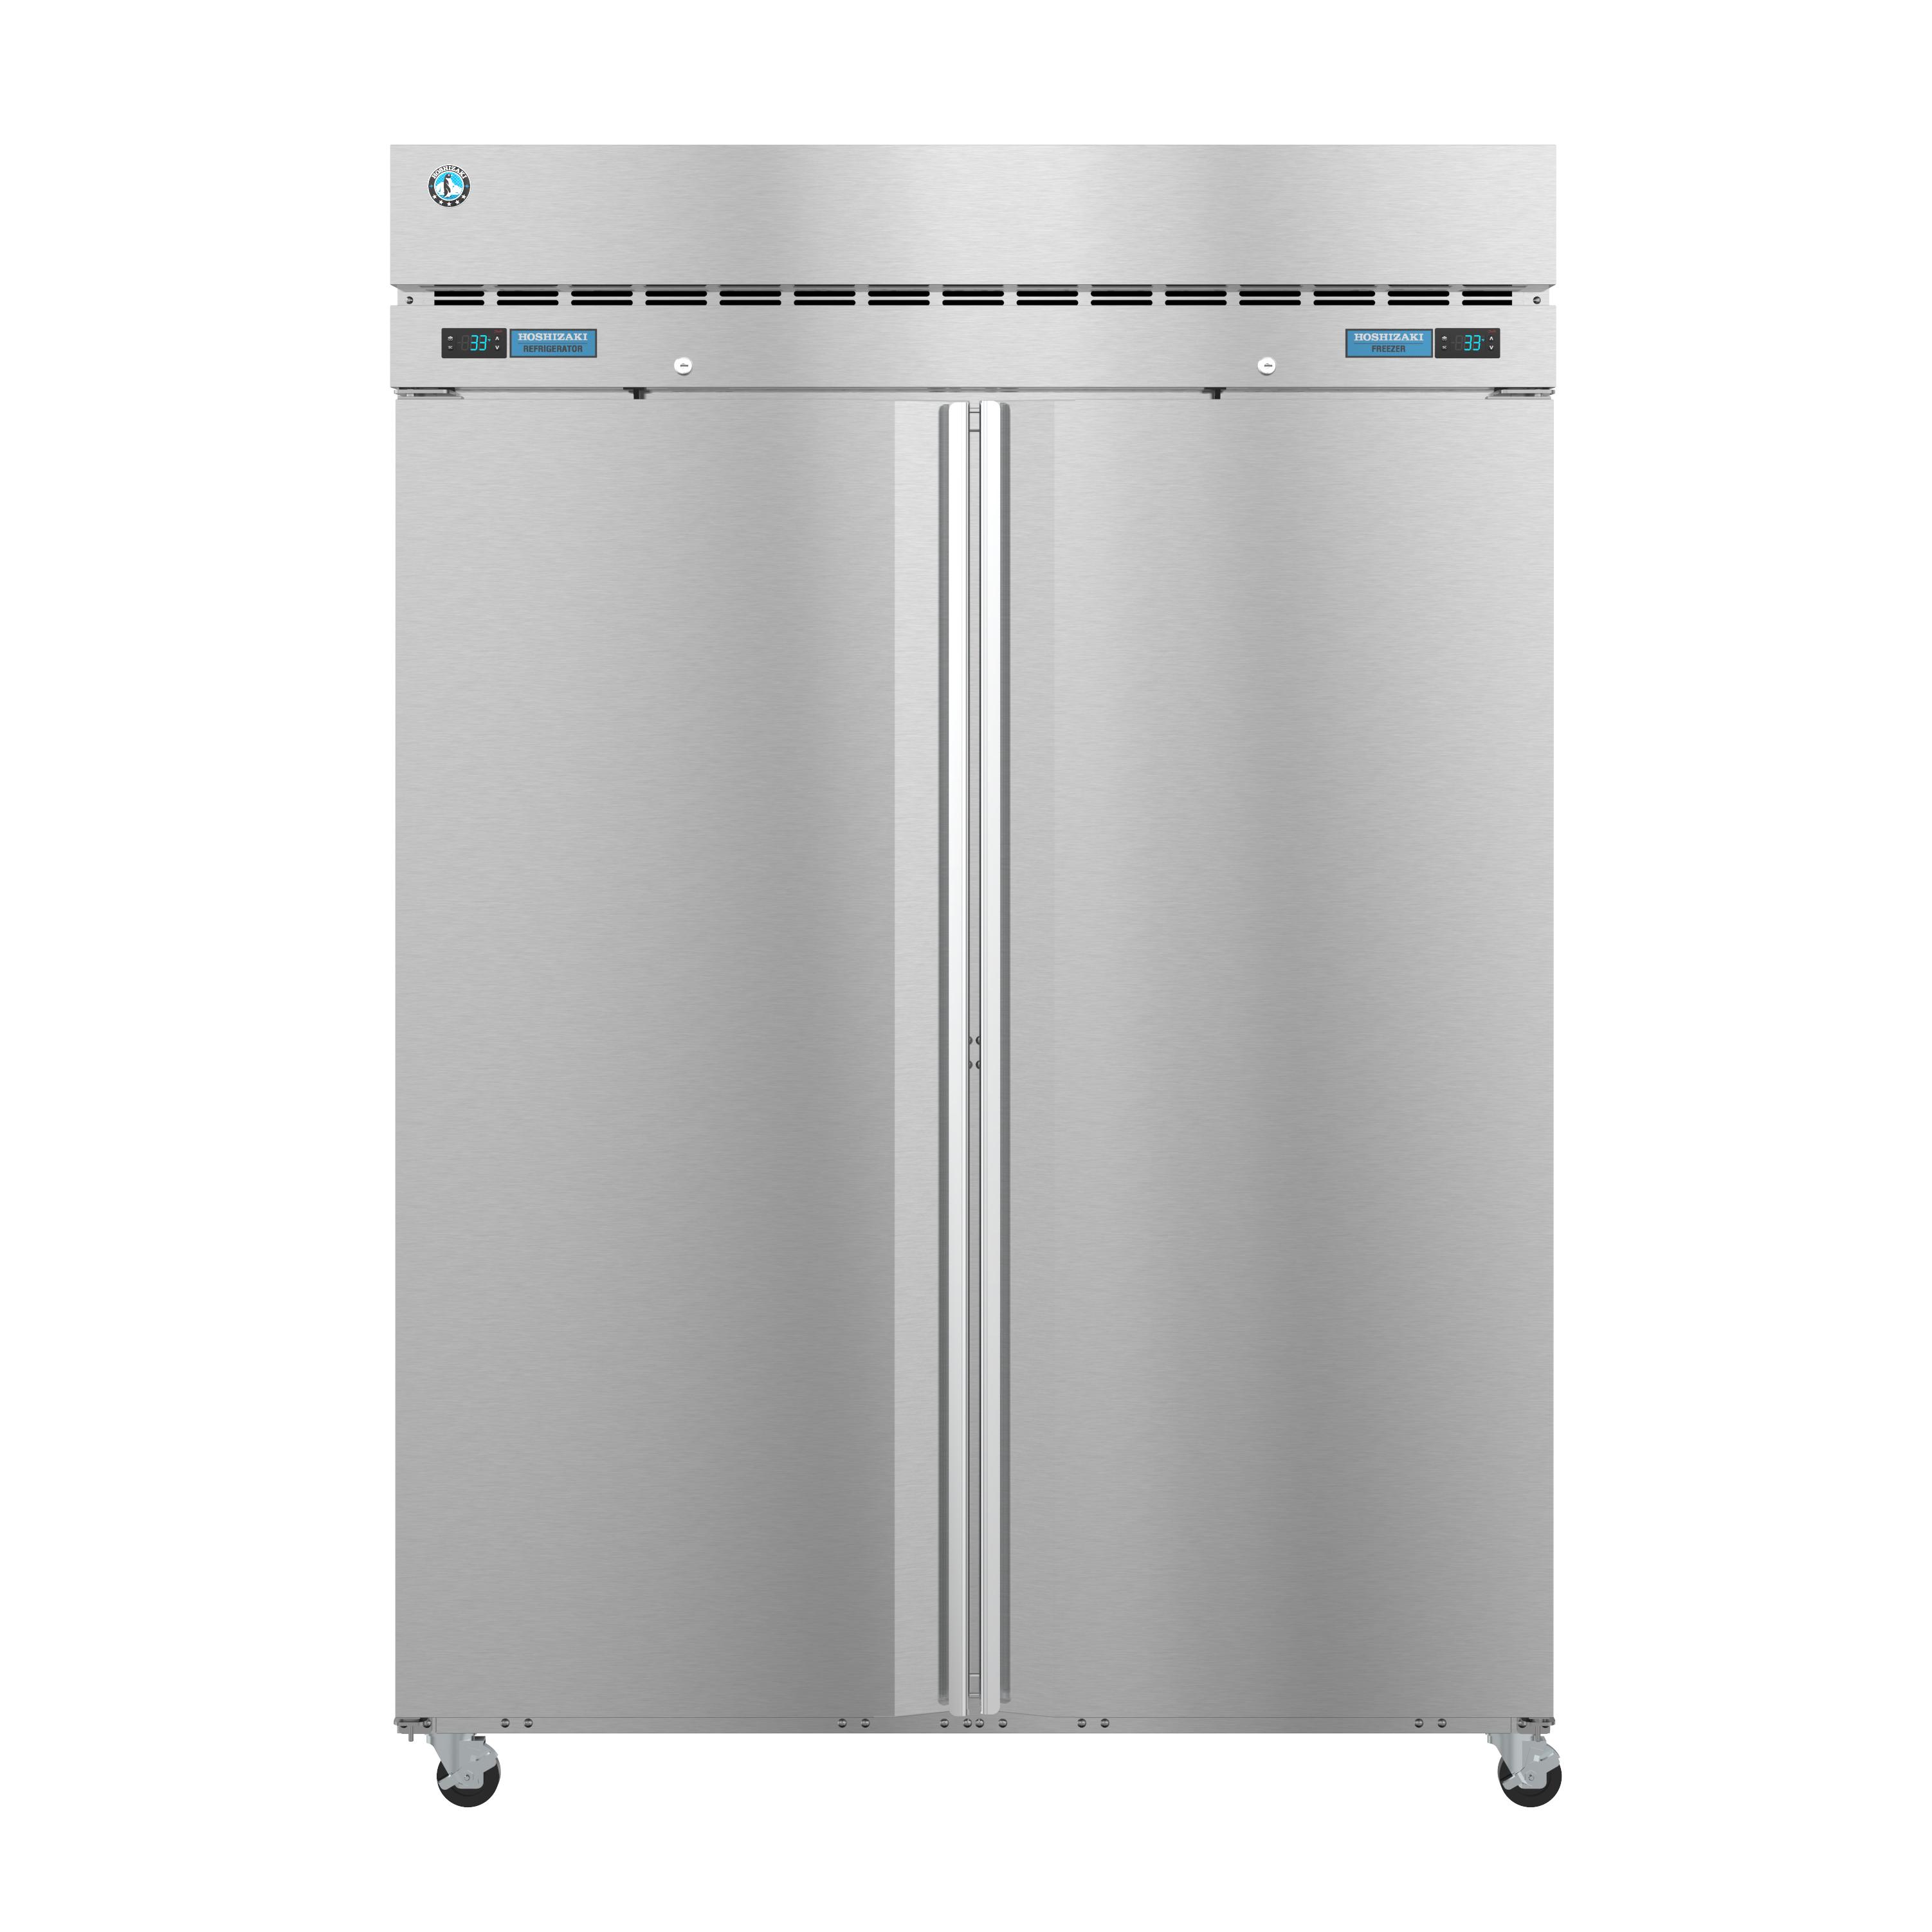 Hoshizaki DT2A-FS reach-in refrigerators & freezers